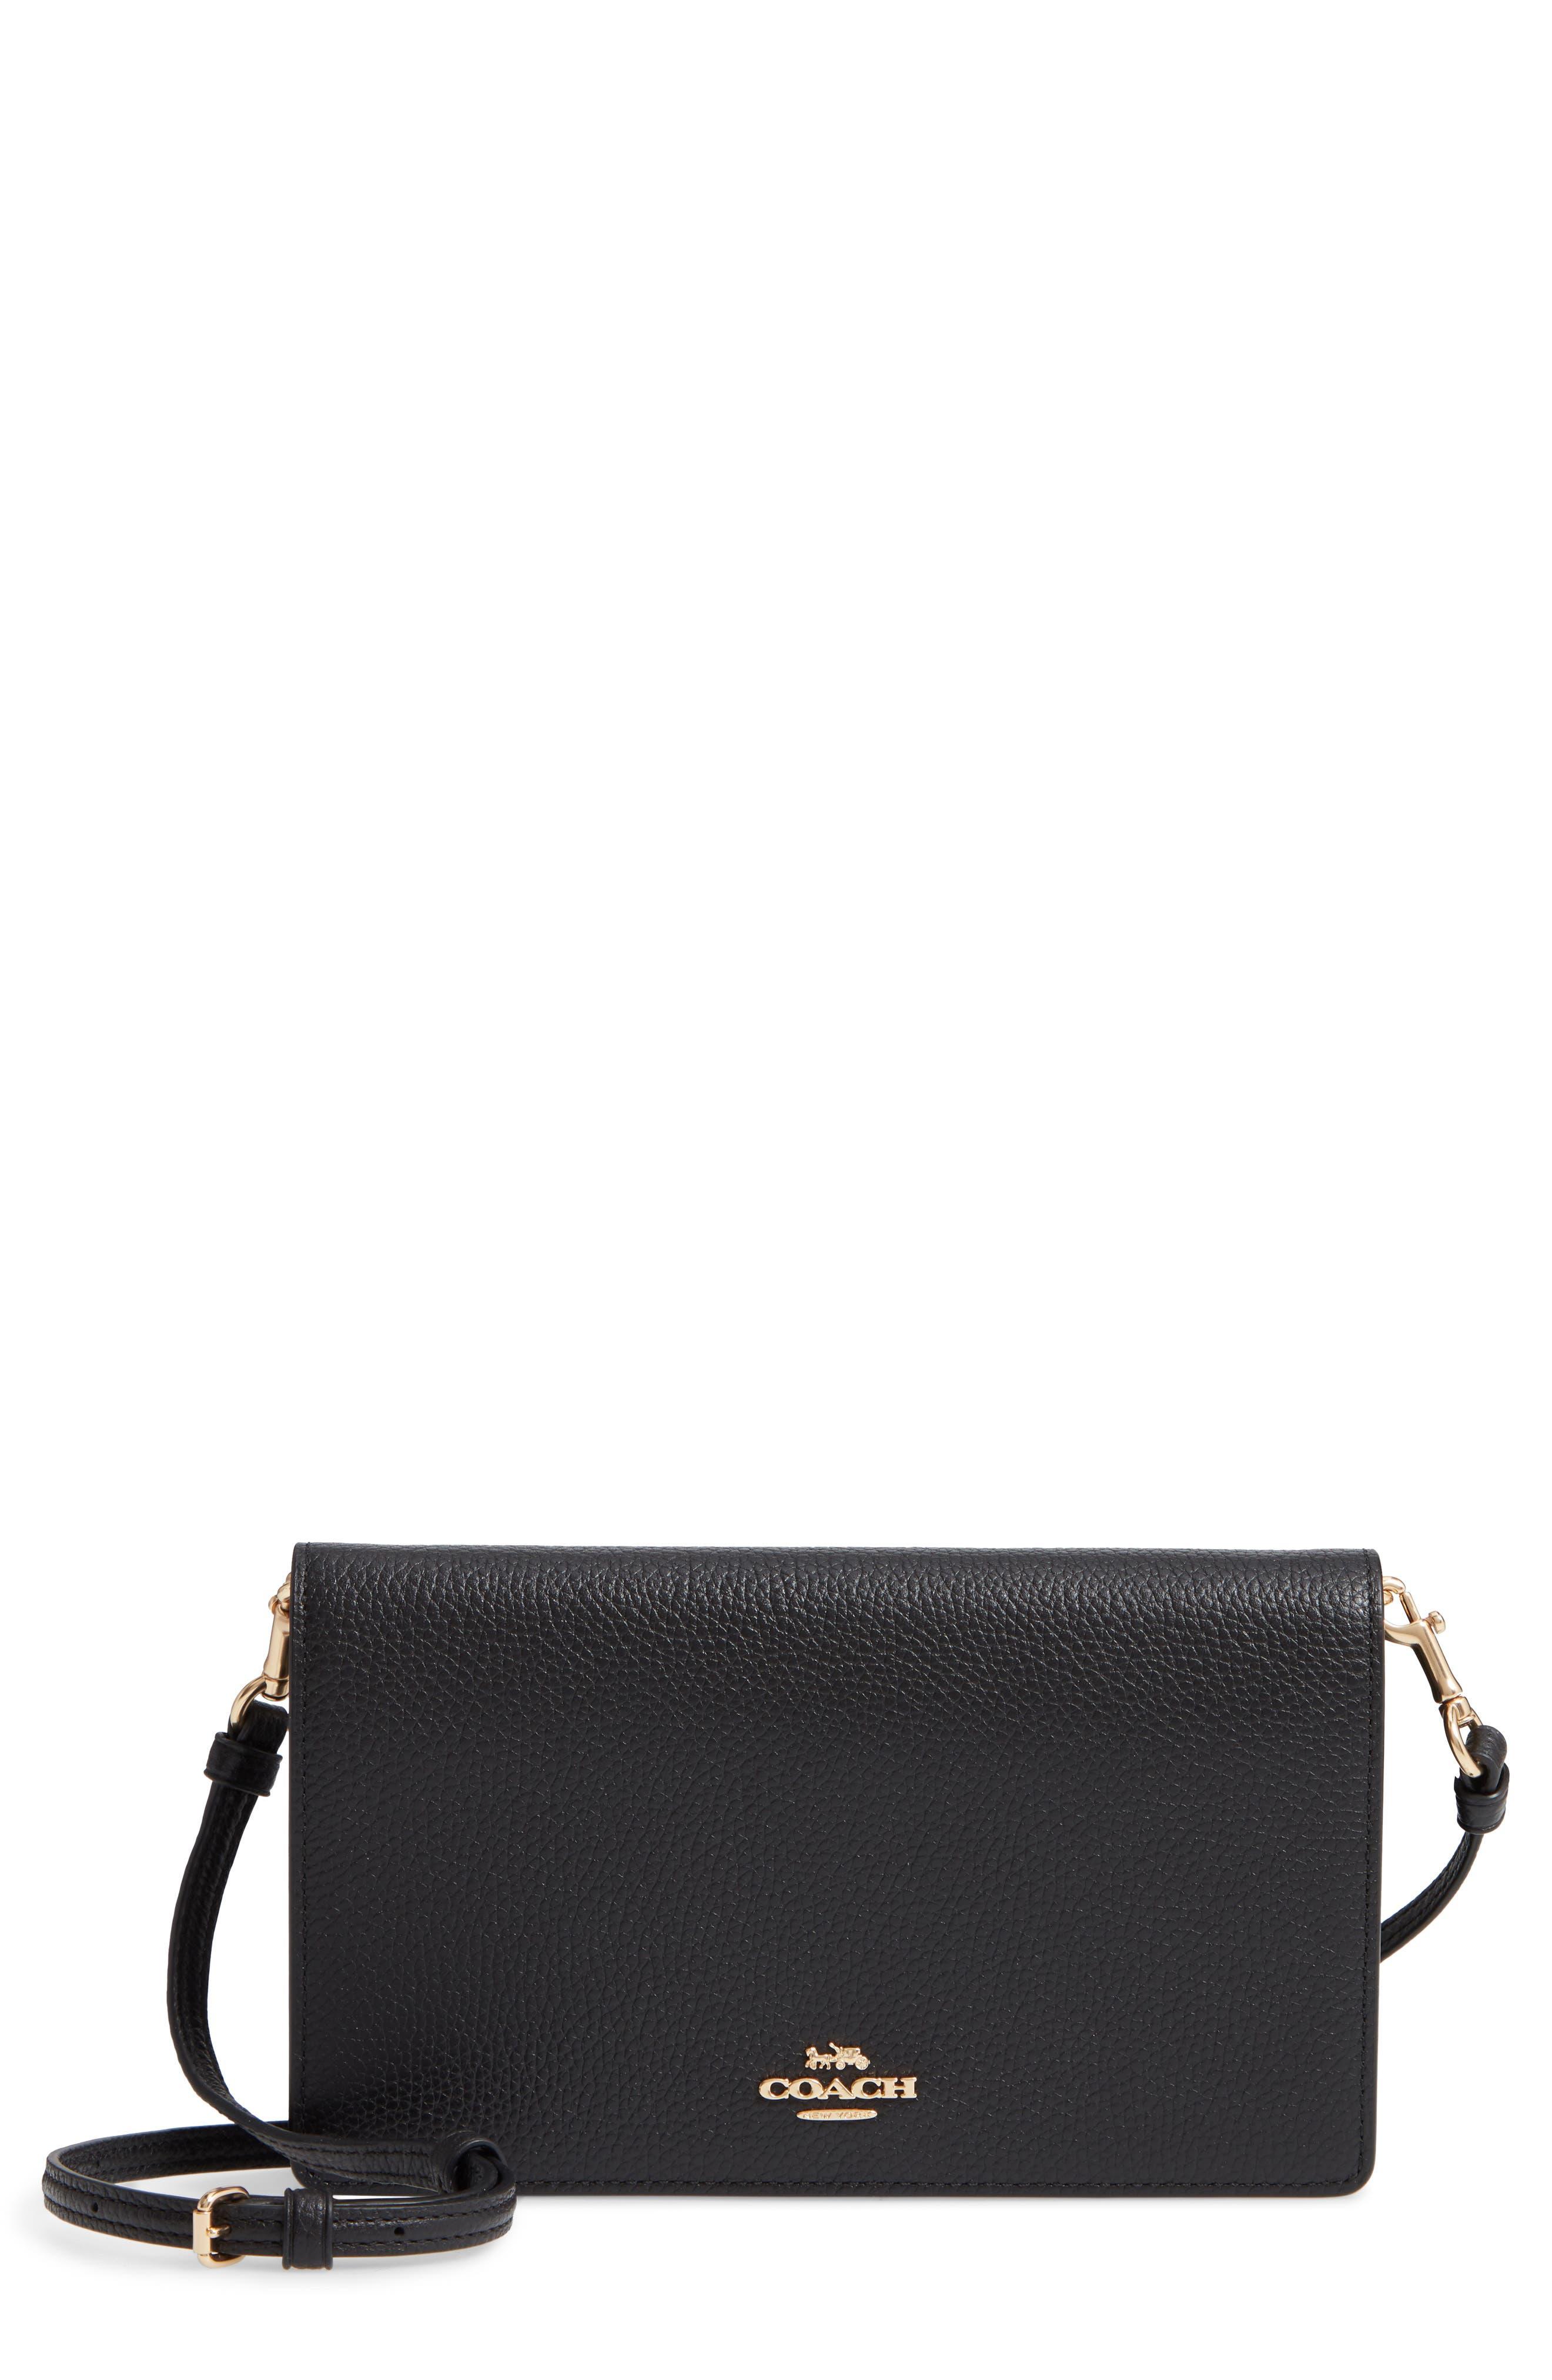 Foldover Calfskin Leather Convertible Clutch, Main, color, LI/ BLACK